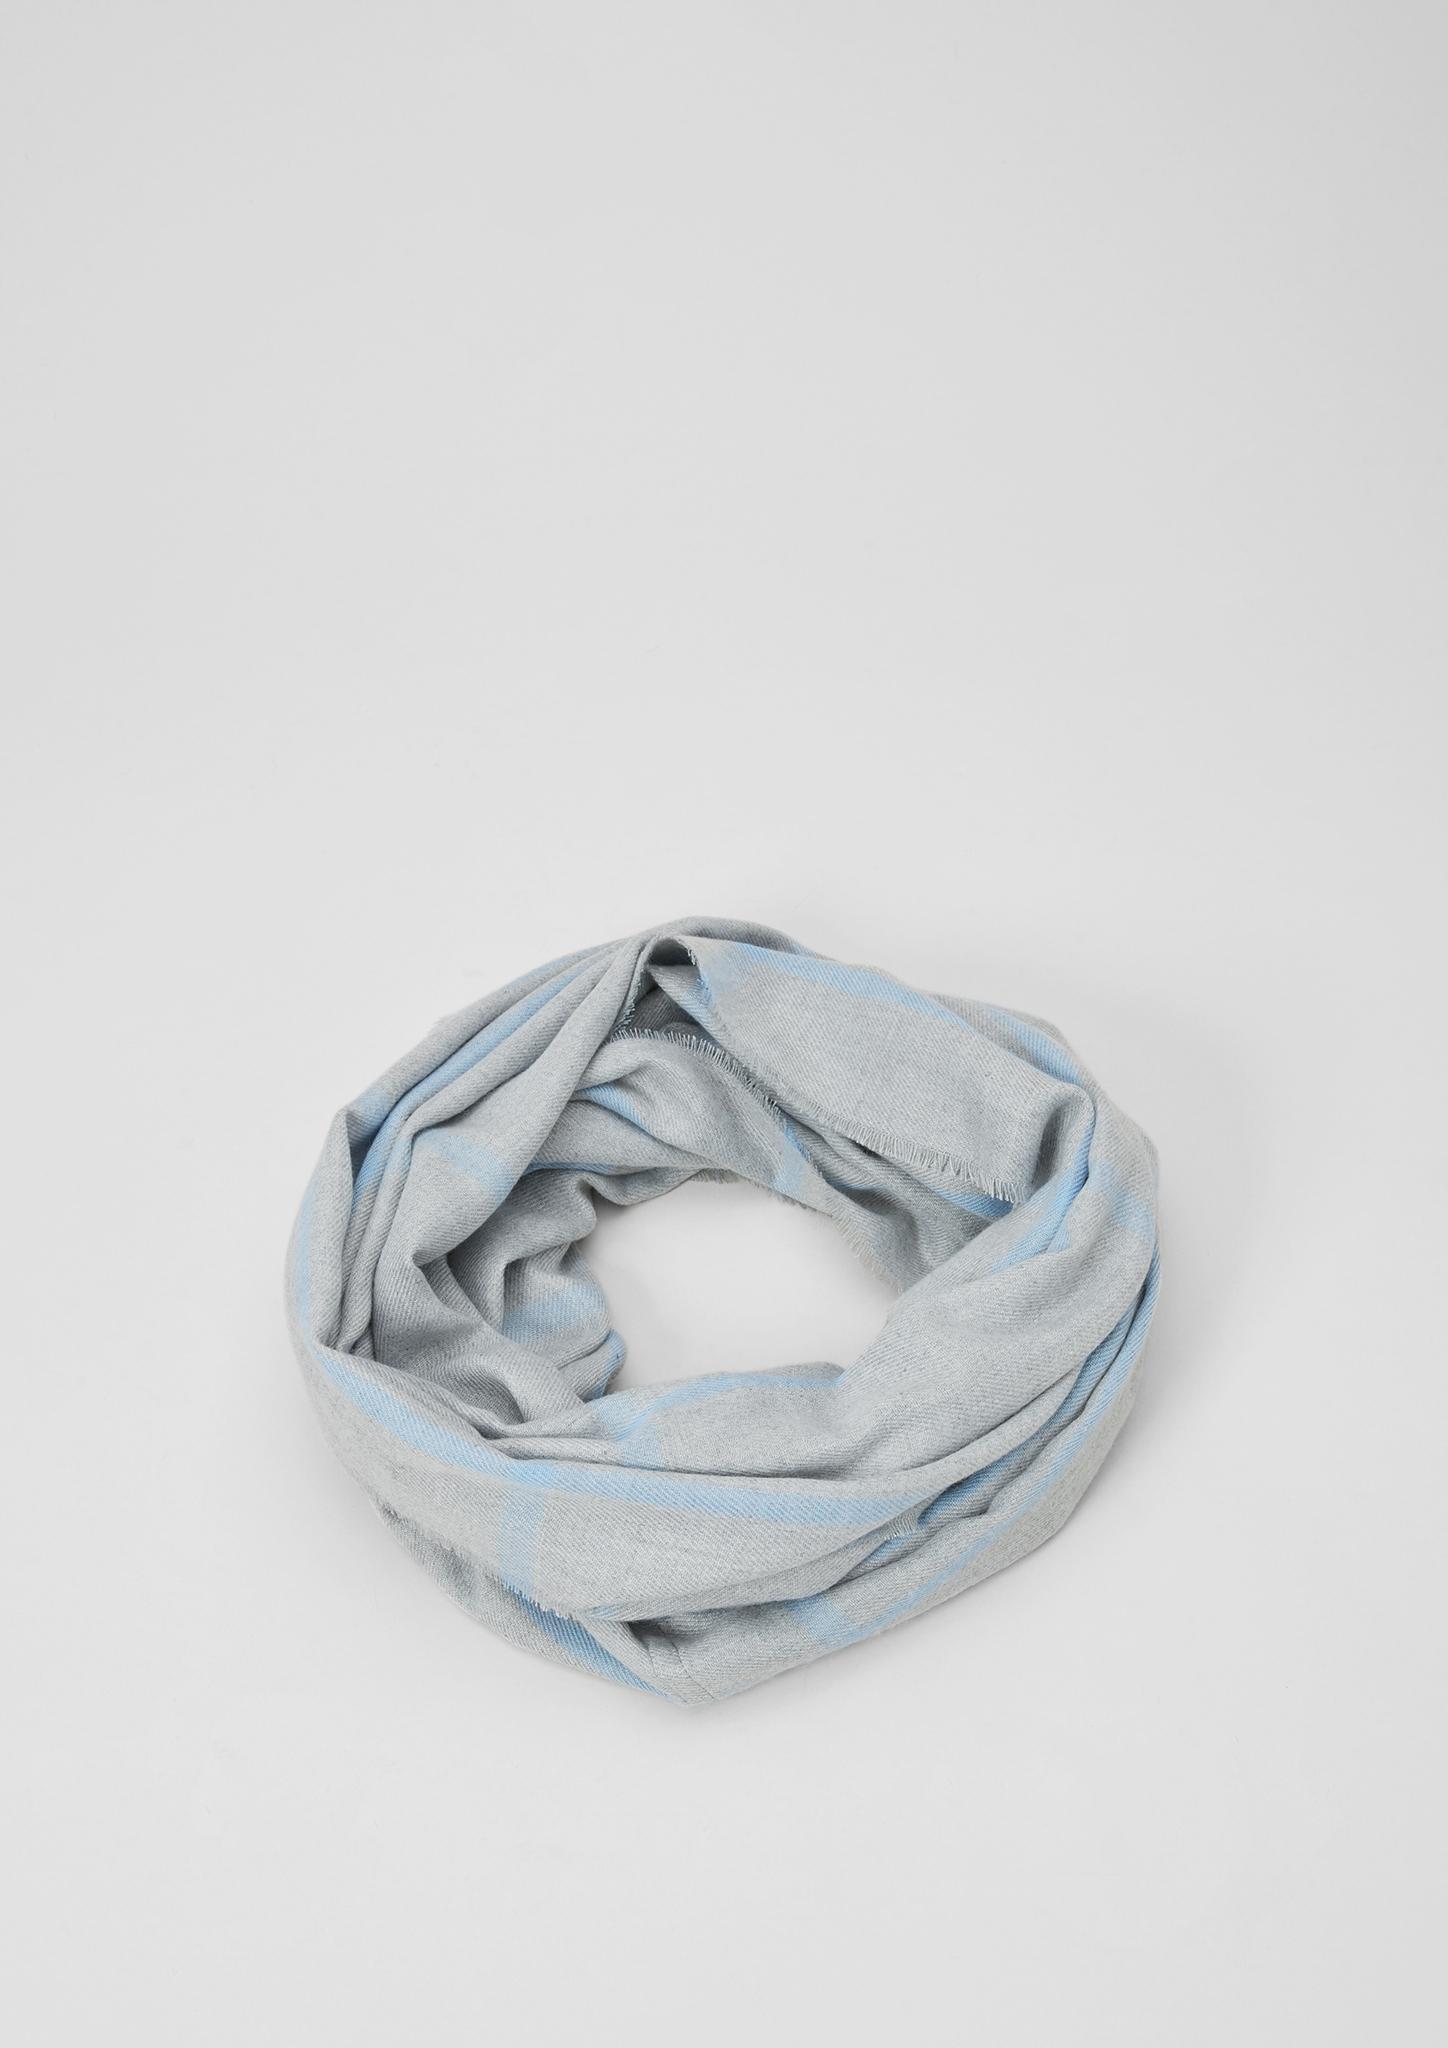 Loop | Accessoires > Schals & Tücher > Loops | Grau | 80% polyester -  20% viskose | s.Oliver